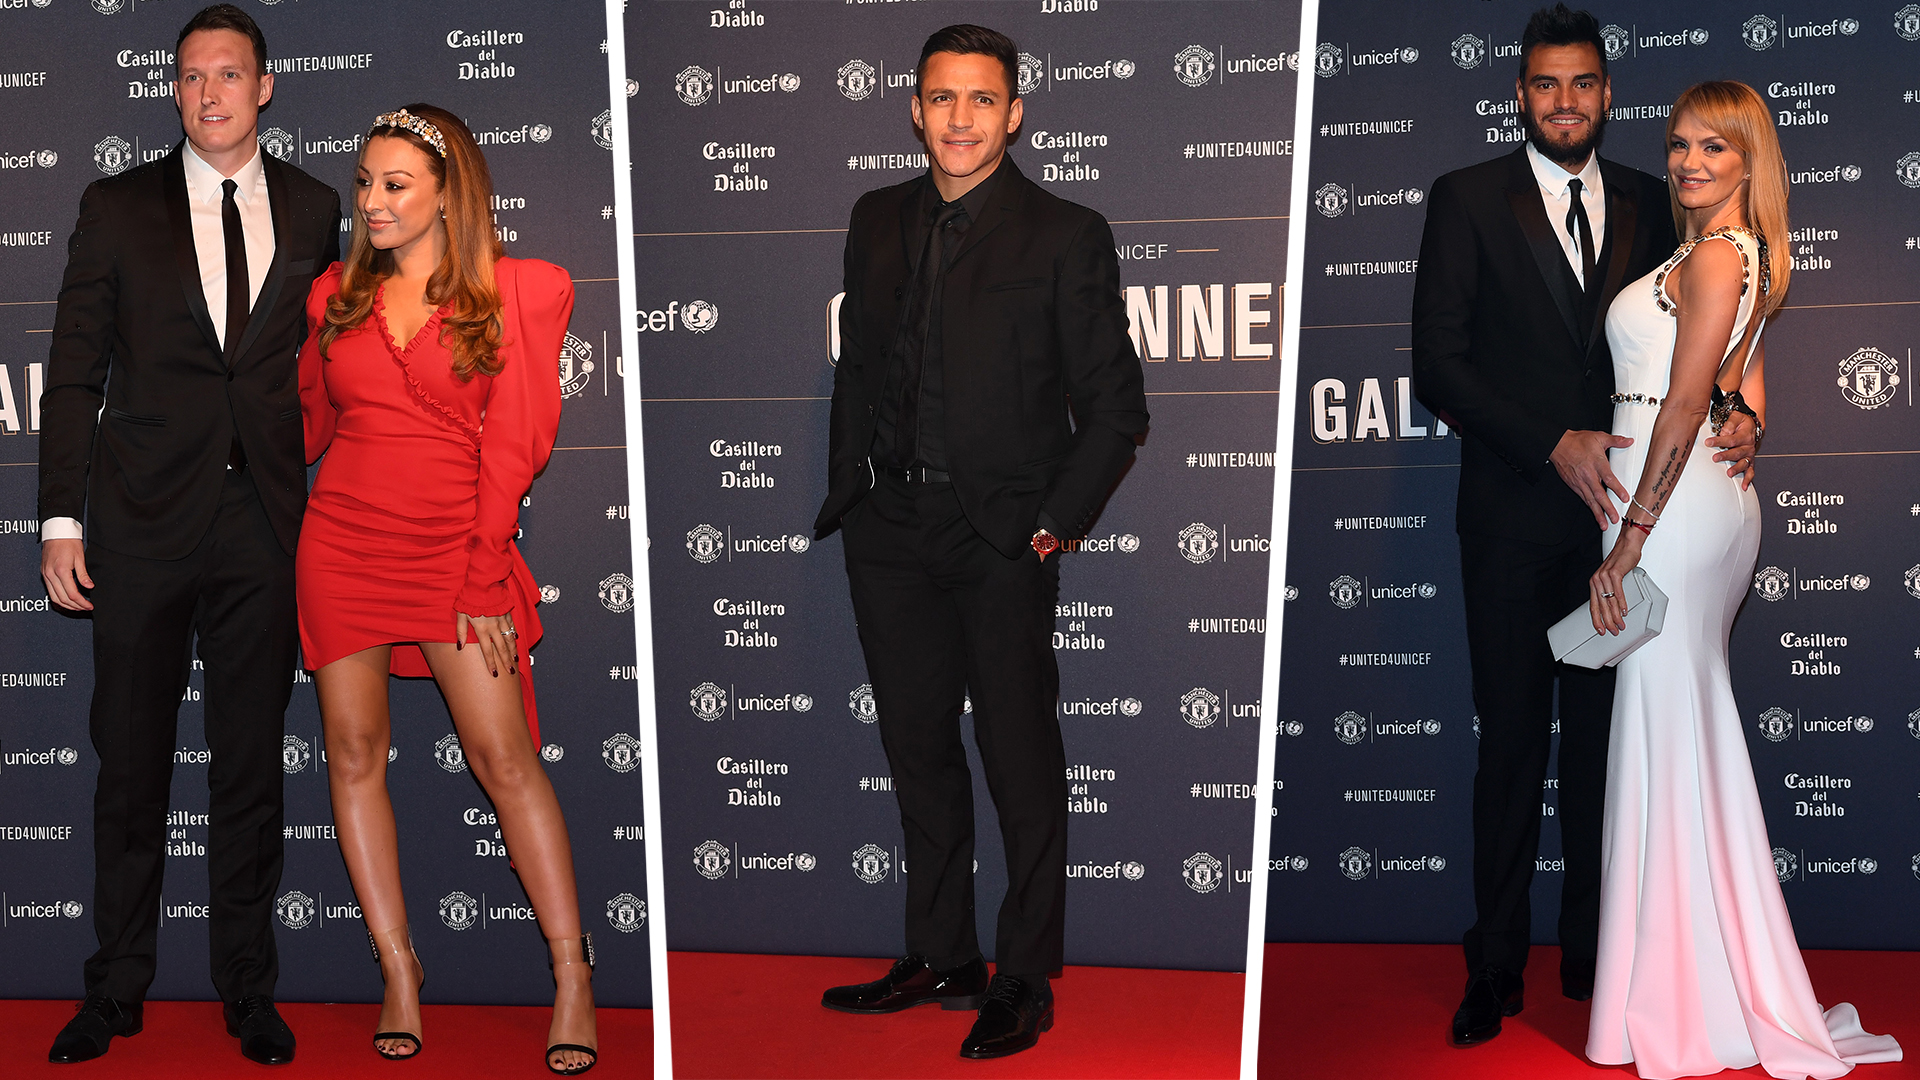 Phil Jones Kaya Jones Alexis Sanchez Sergio Romero Eliana Guercio Man Utd 2019